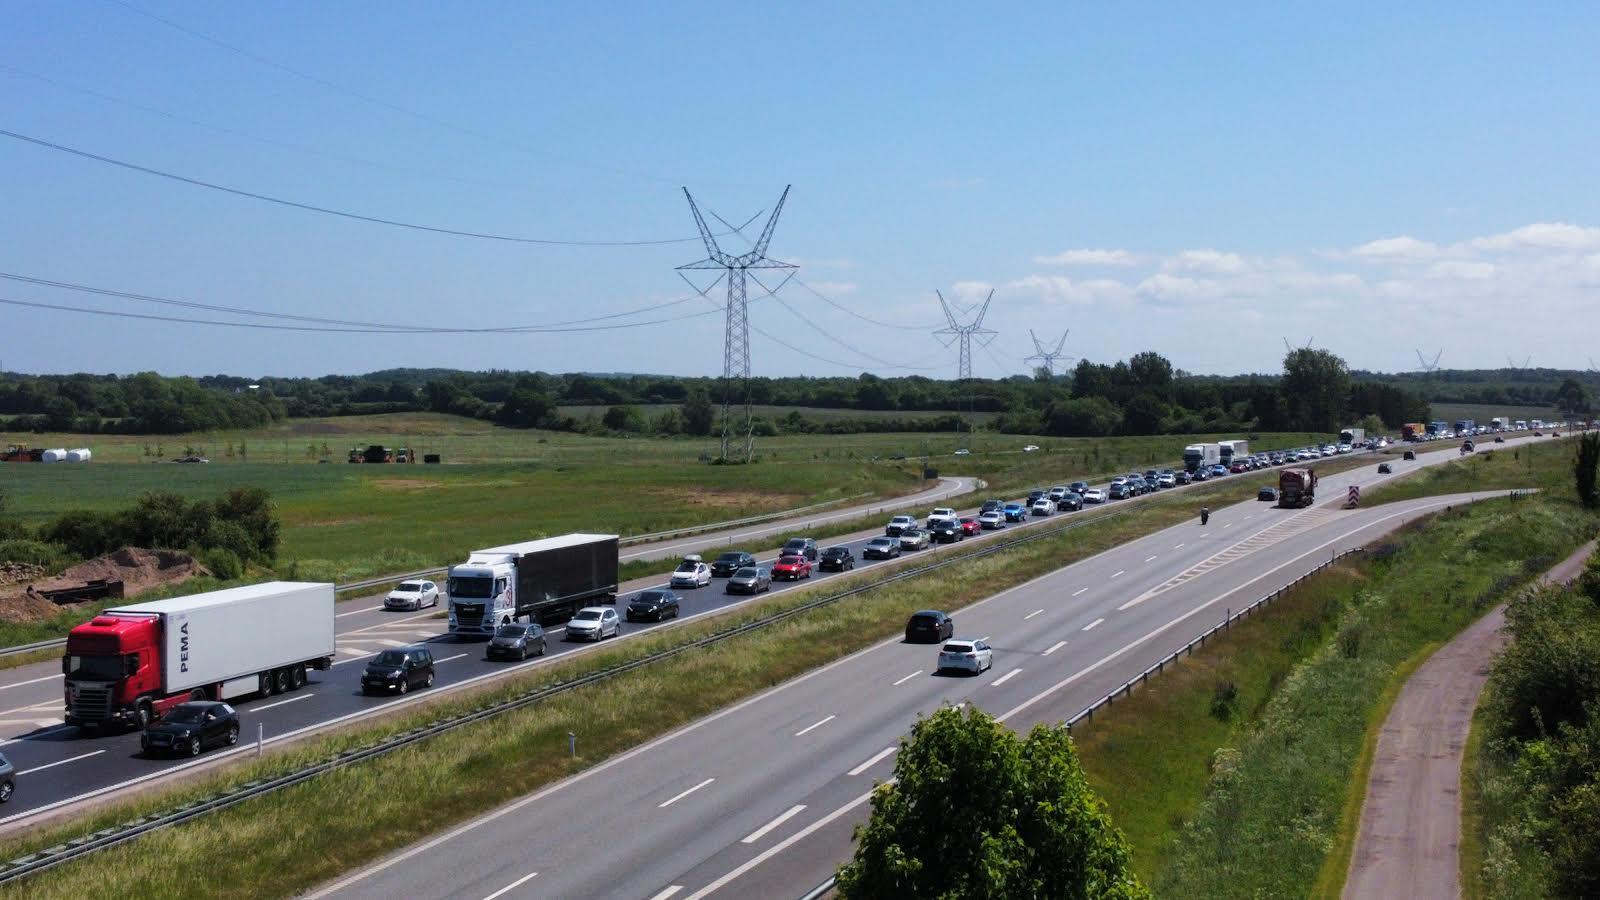 Større kø på sønderjysk motorvej i forbindelse med en bilbrand